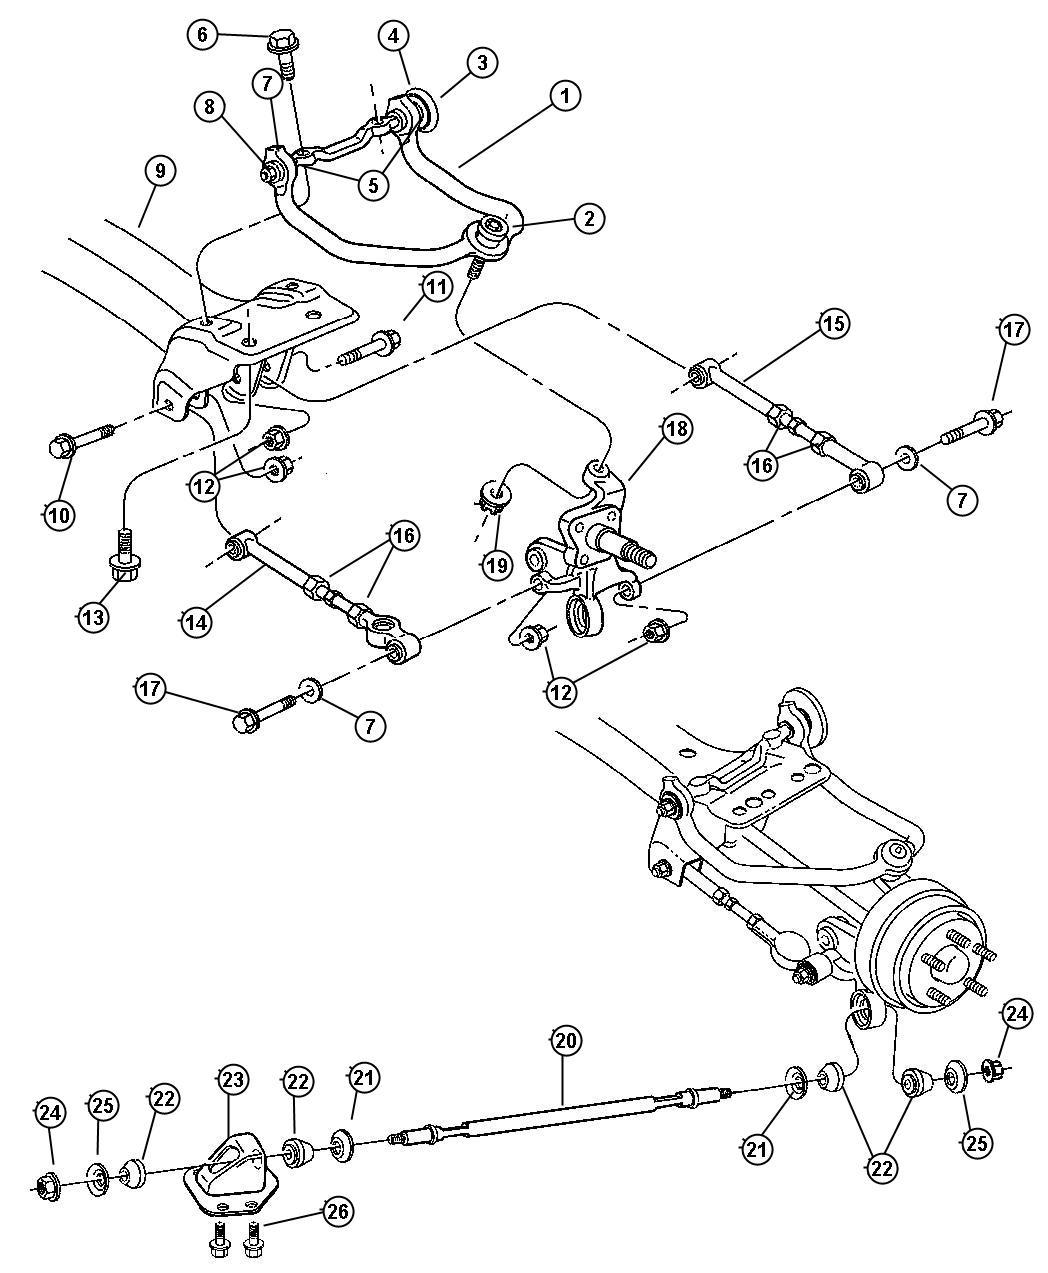 Chrysler Sebring Arm Control Right Upper Suspension